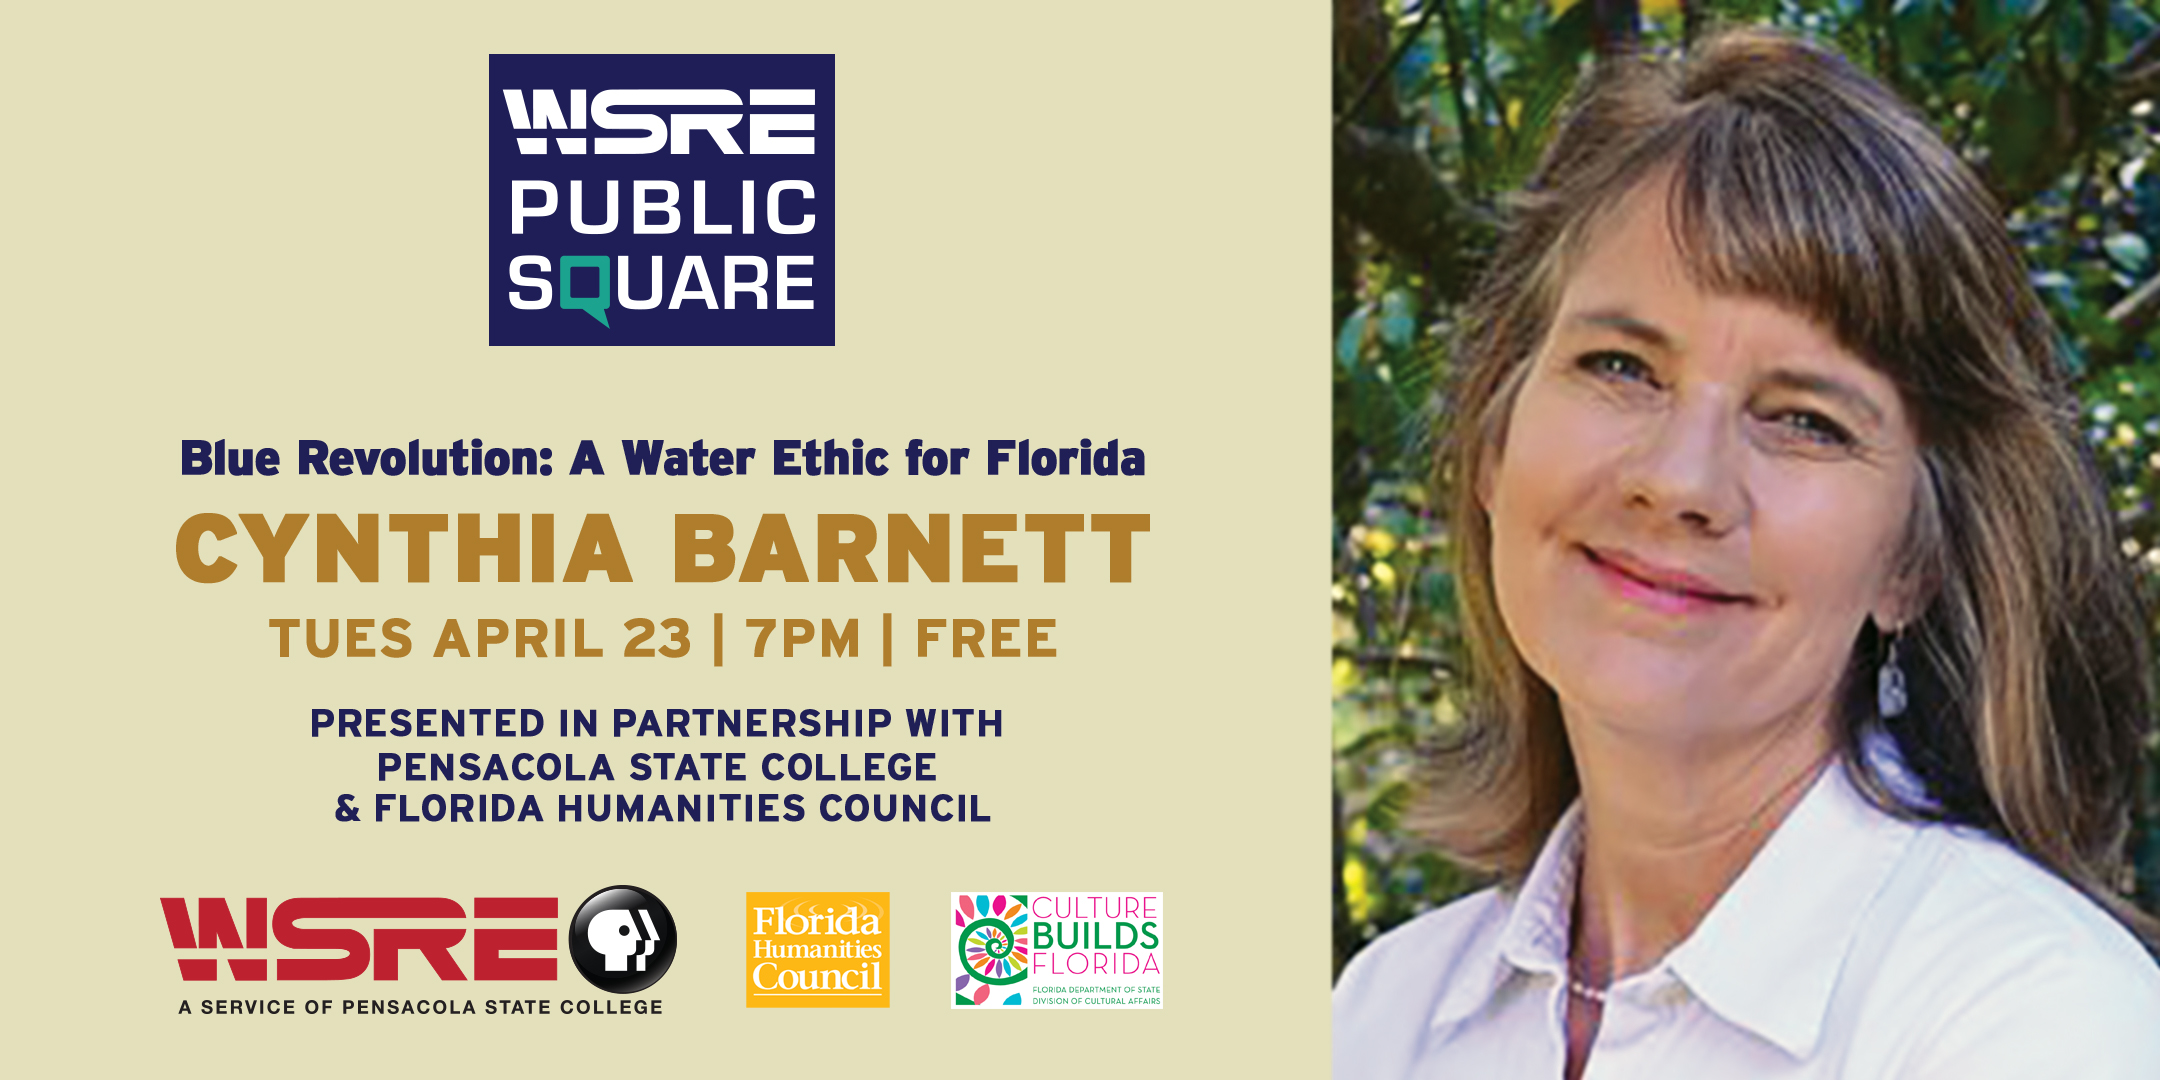 Cynthia Barnett - Blue Revolution: A Water Ethic for Florida